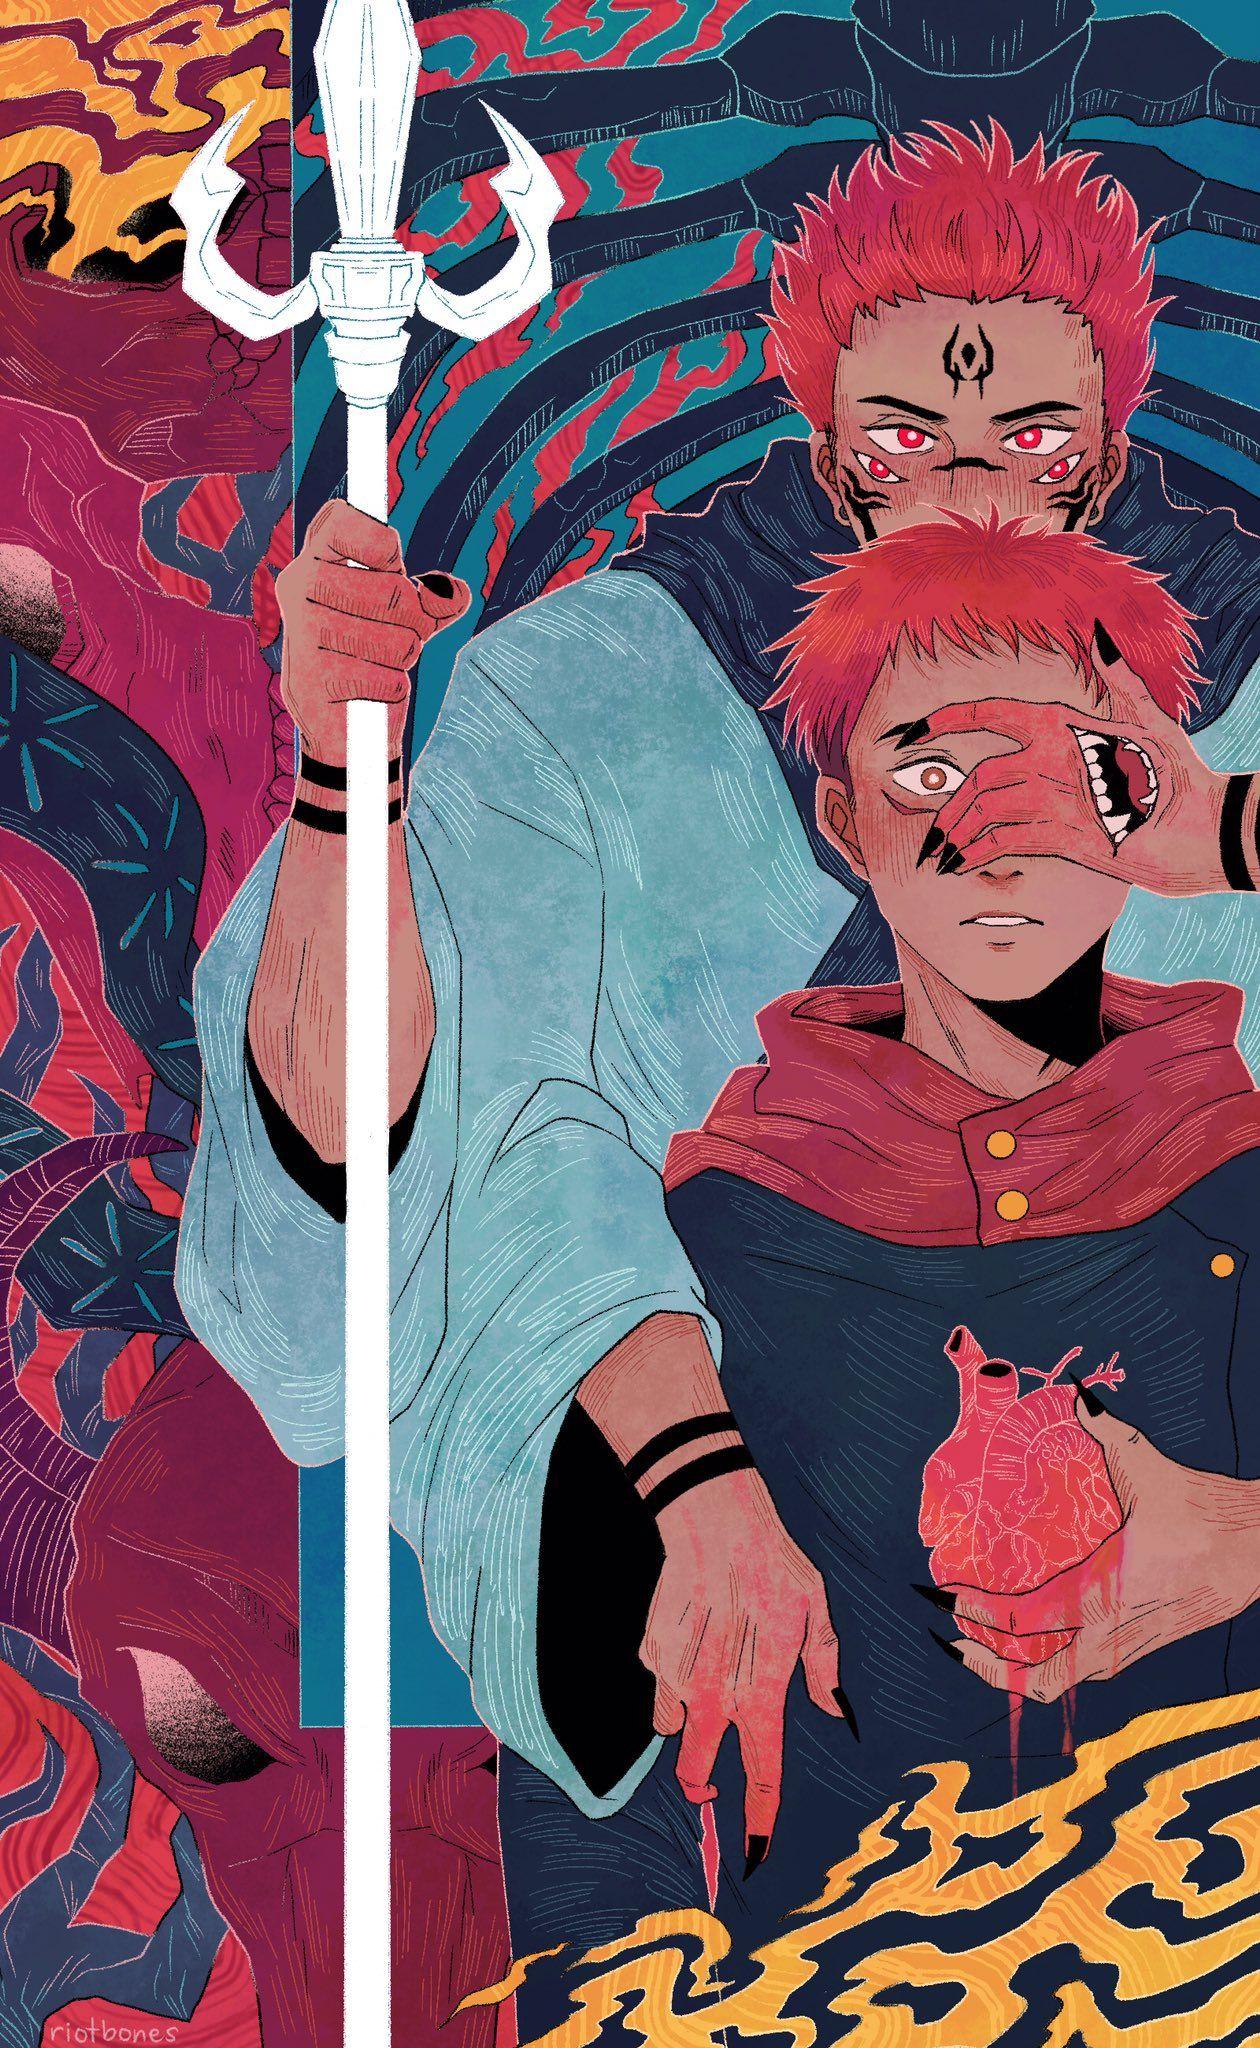 Bones Zine Grind On Twitter In 2021 Anime Cute Anime Character Jujutsu